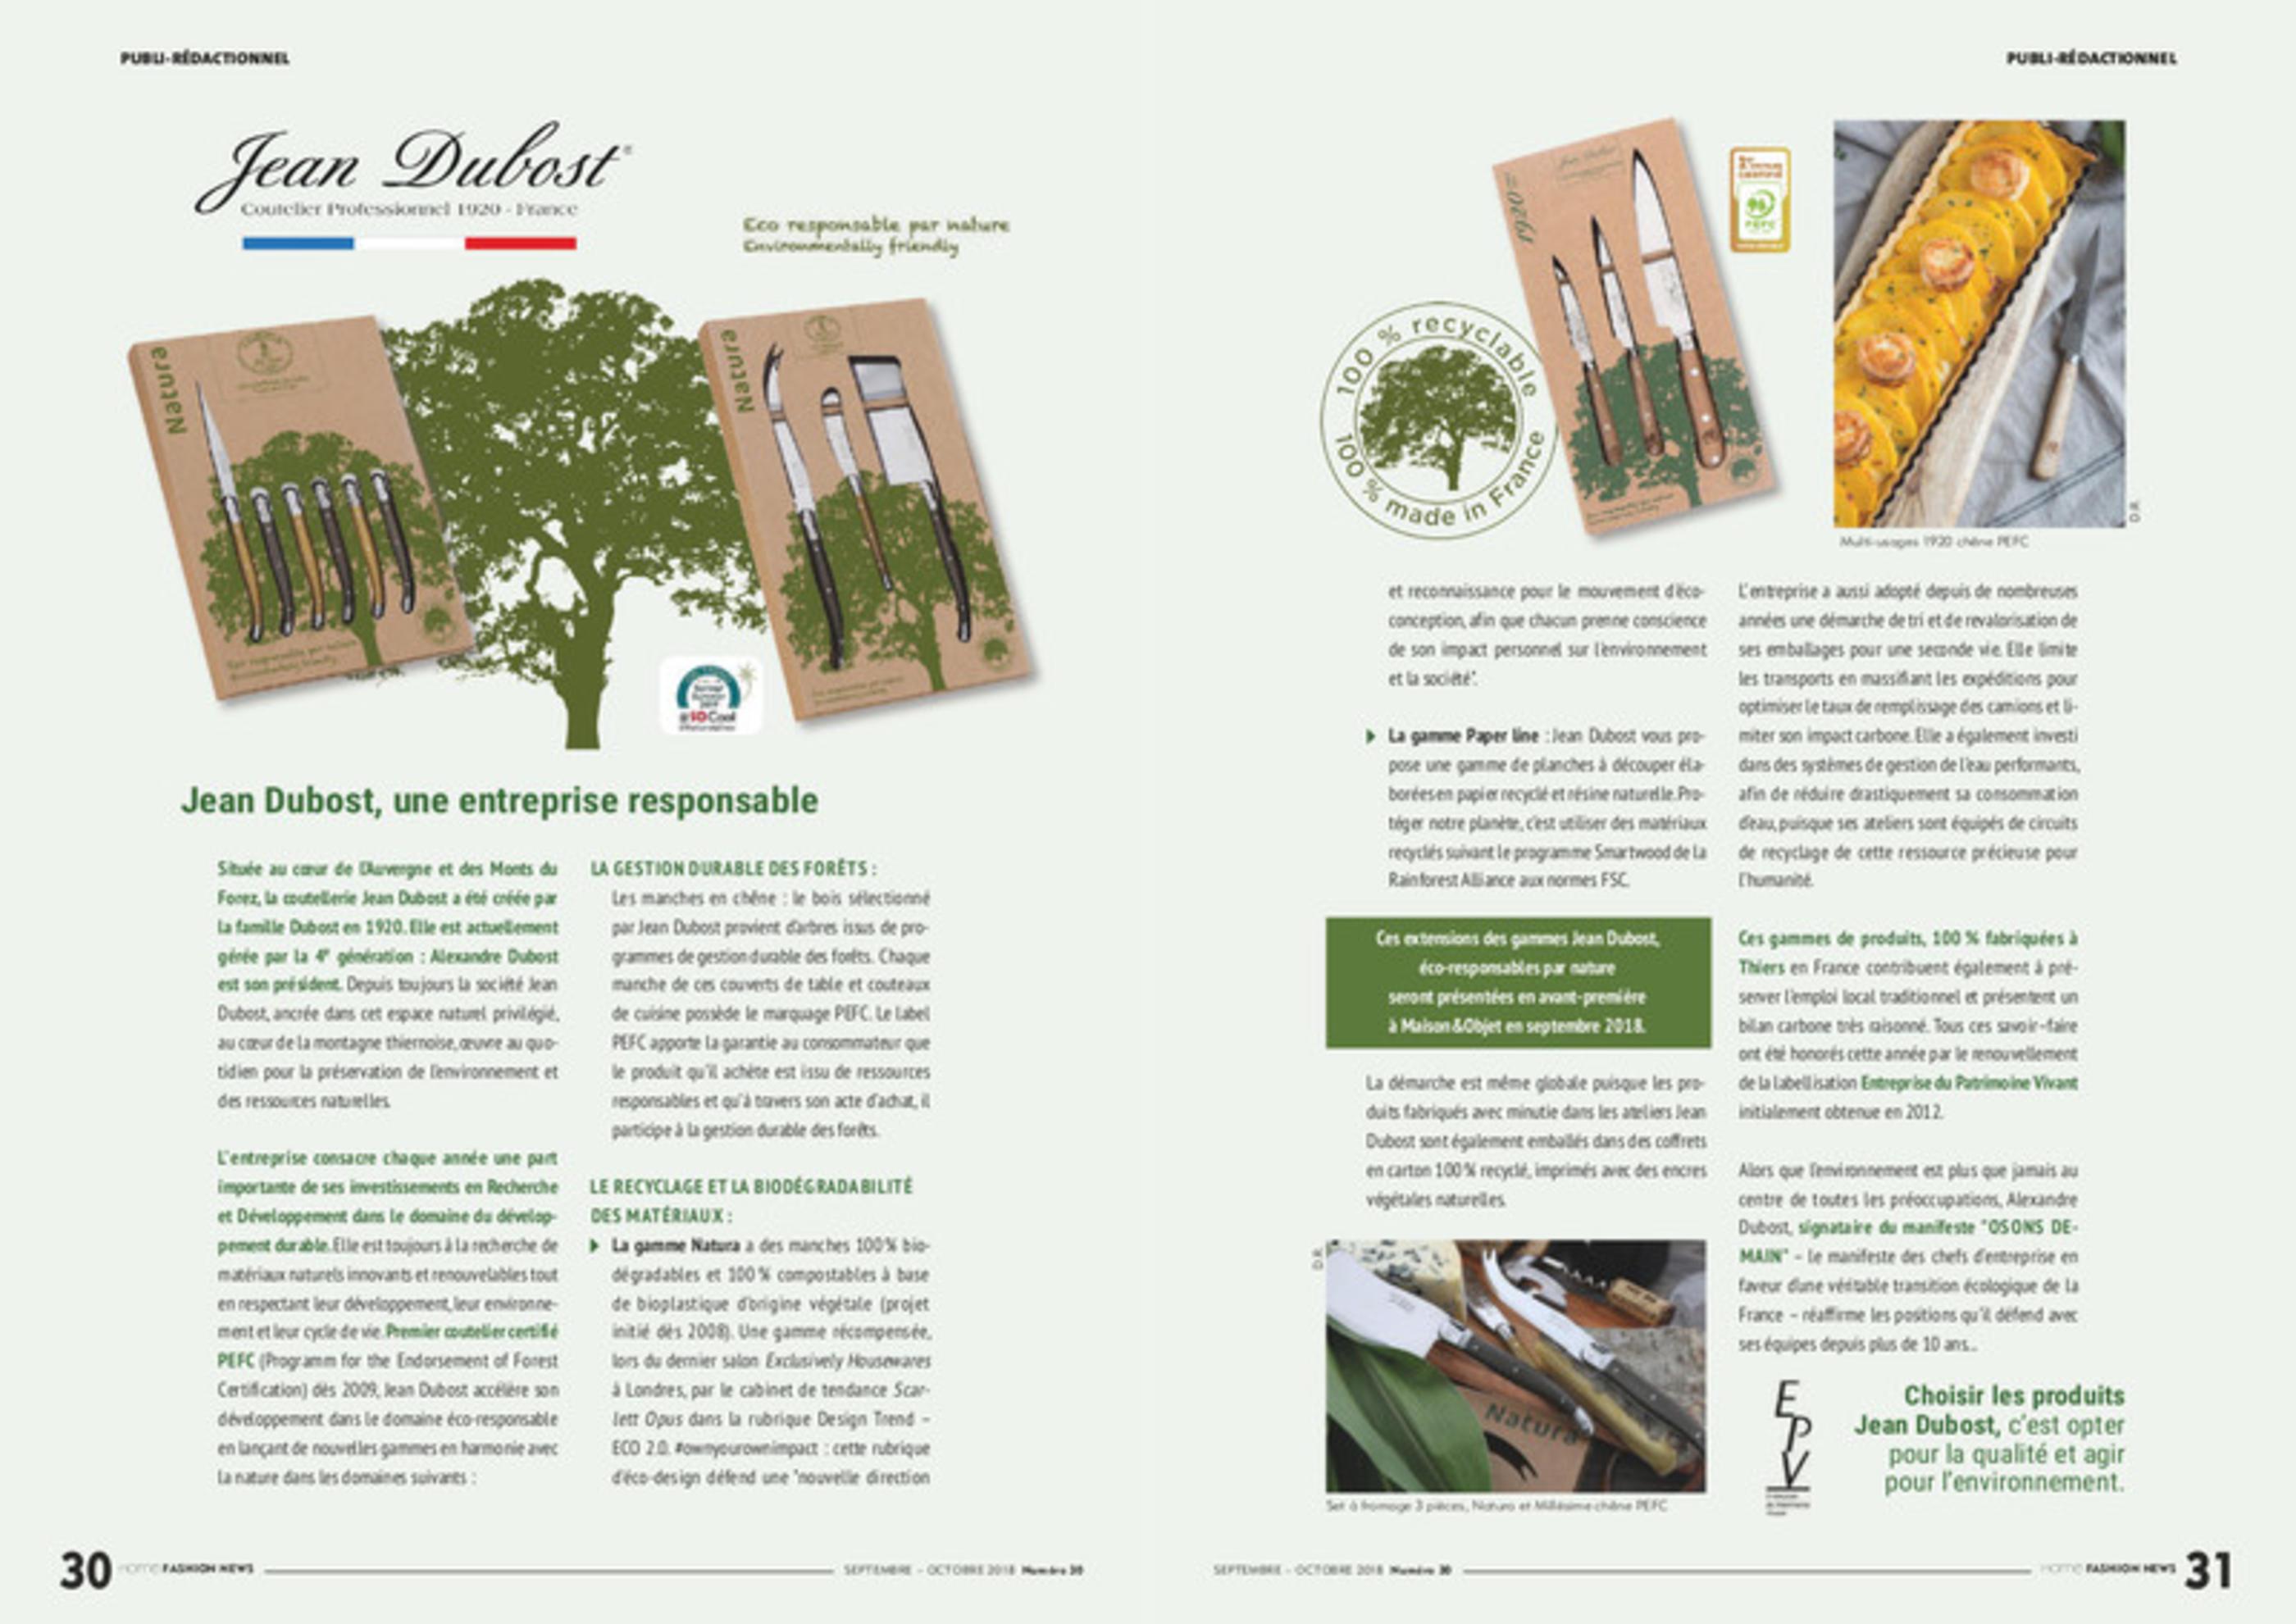 Jean Dubost An Ecofriendly French Cutlery Home Fashion News